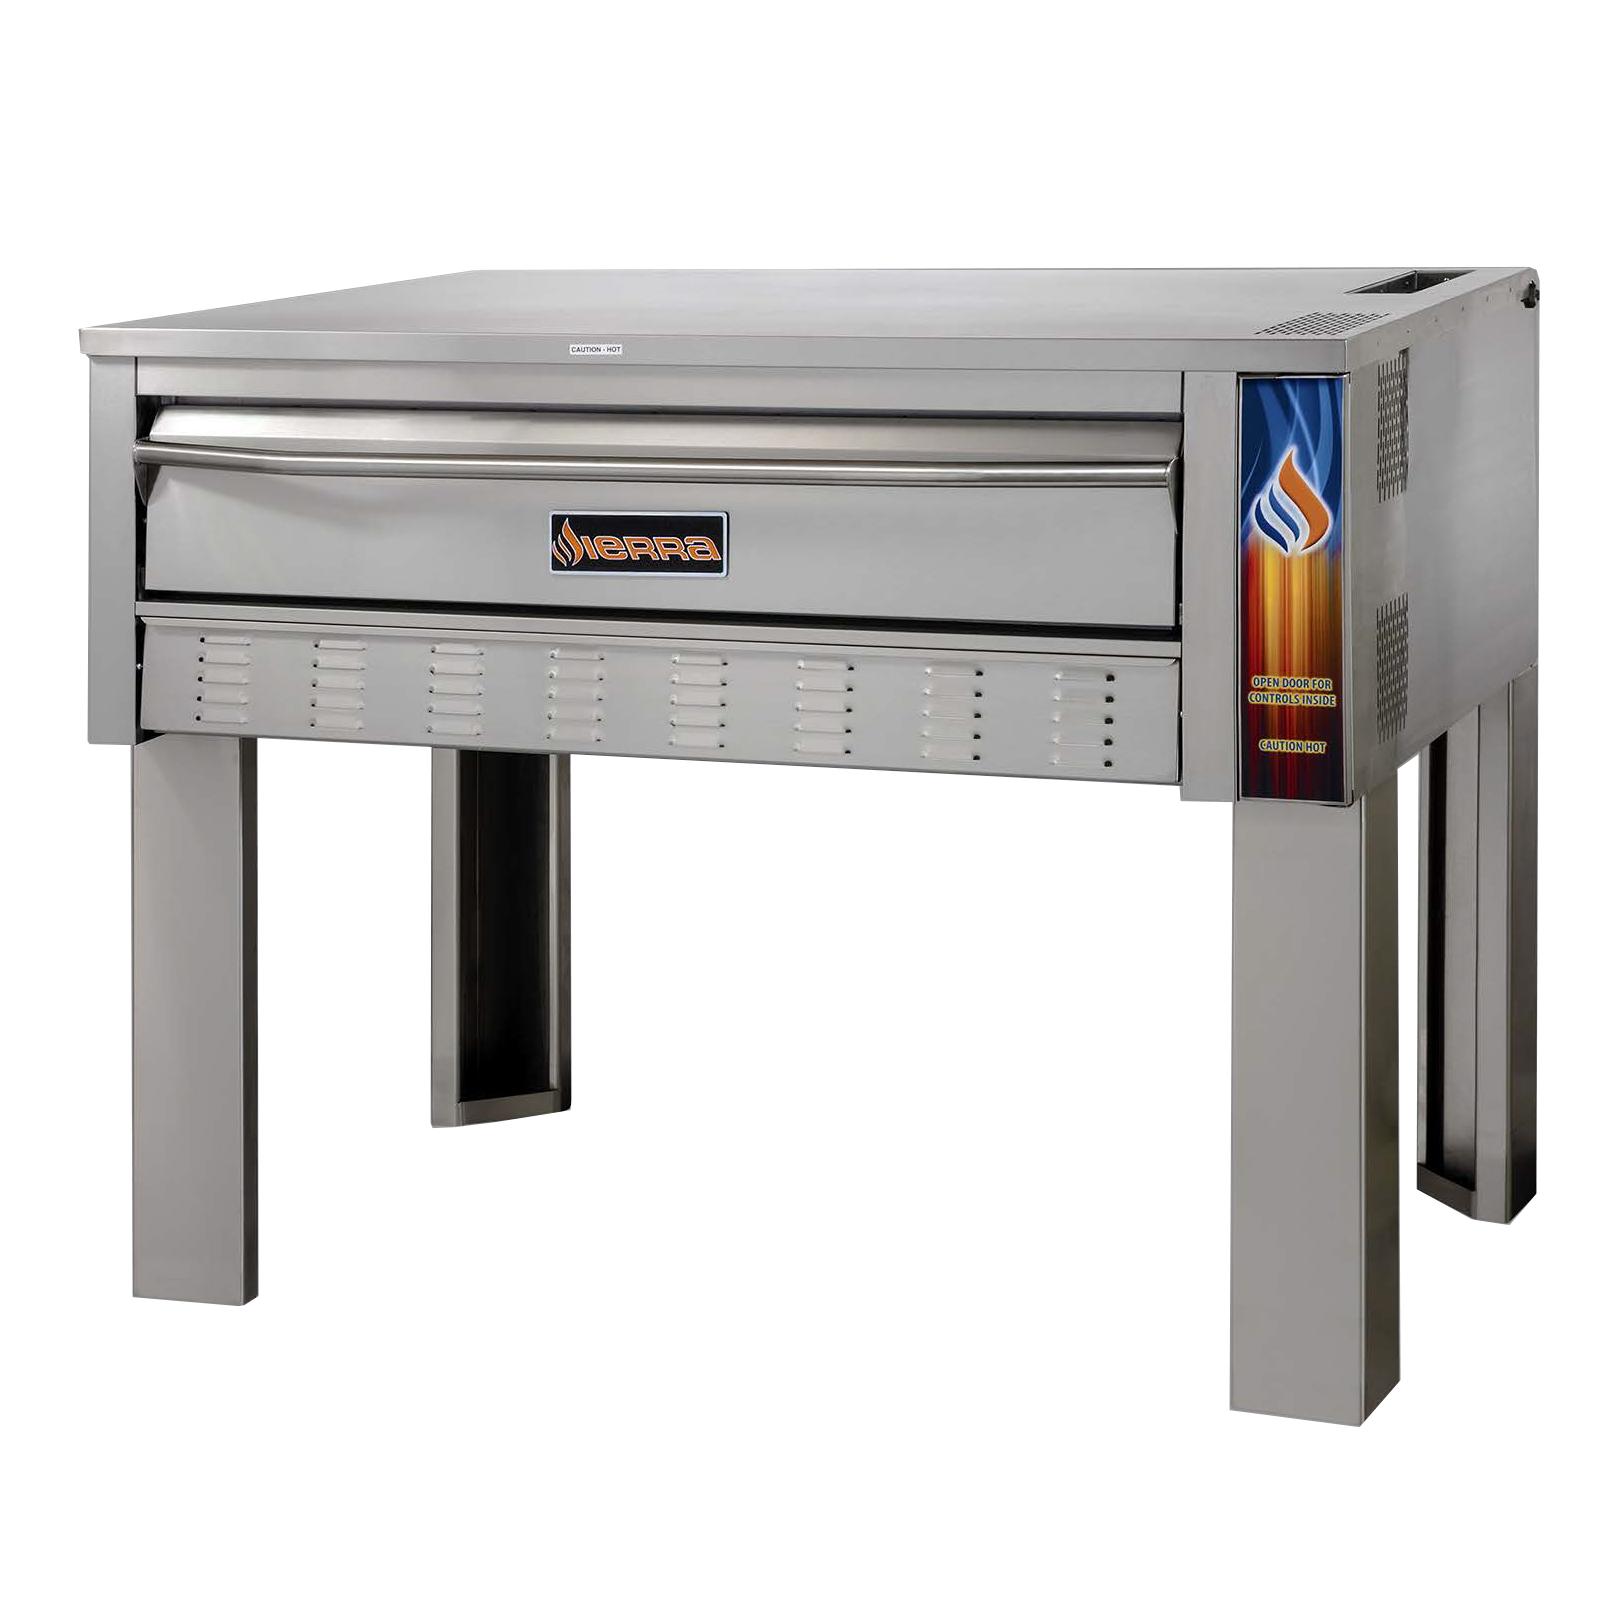 MVP SRPO-72G pizza bake oven, deck-type, gas